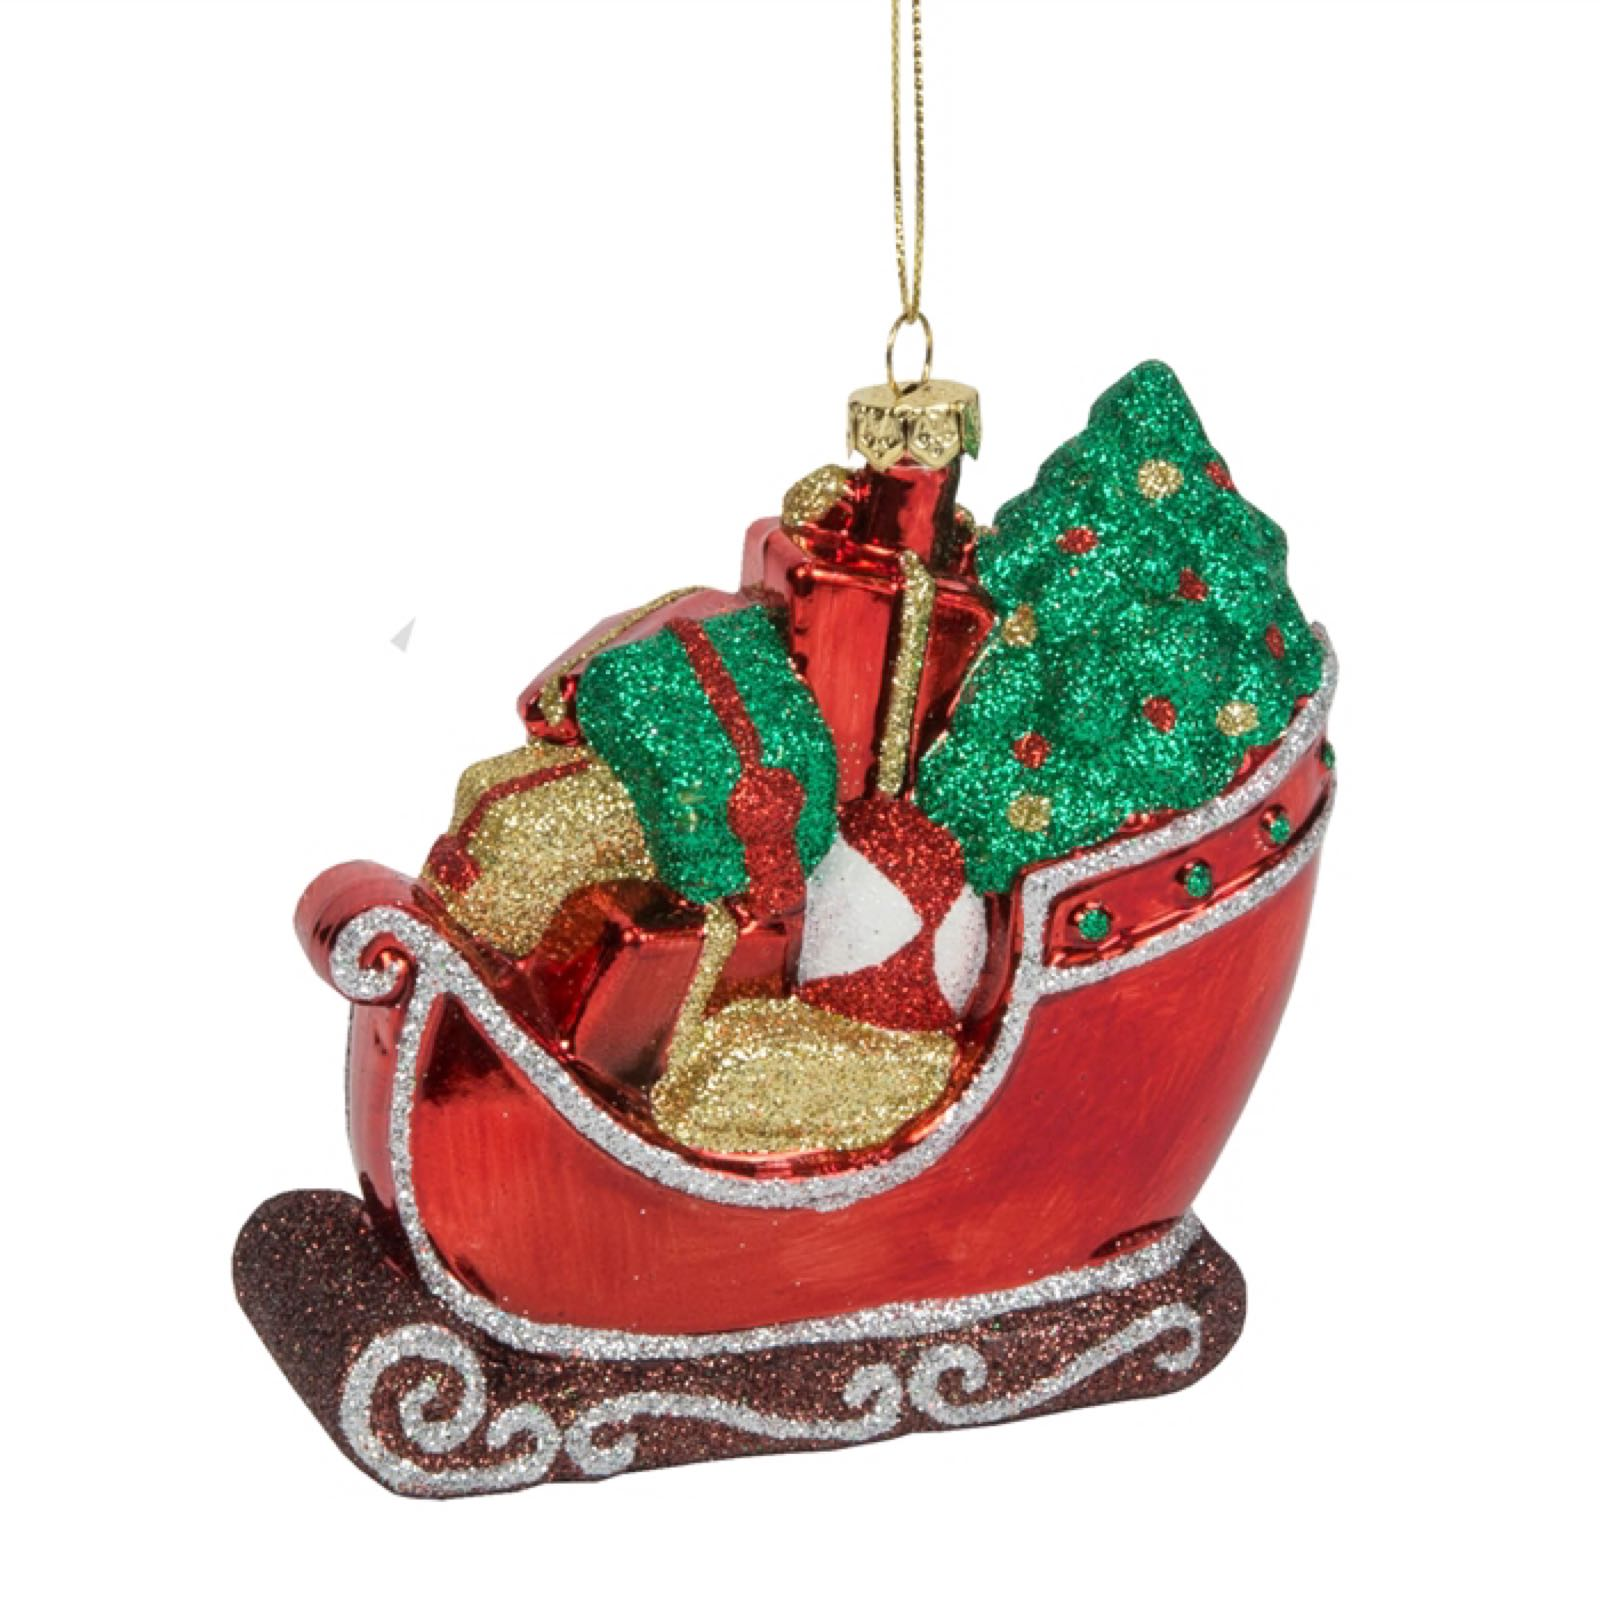 'Santa's Sleigh' Oversized Decoration